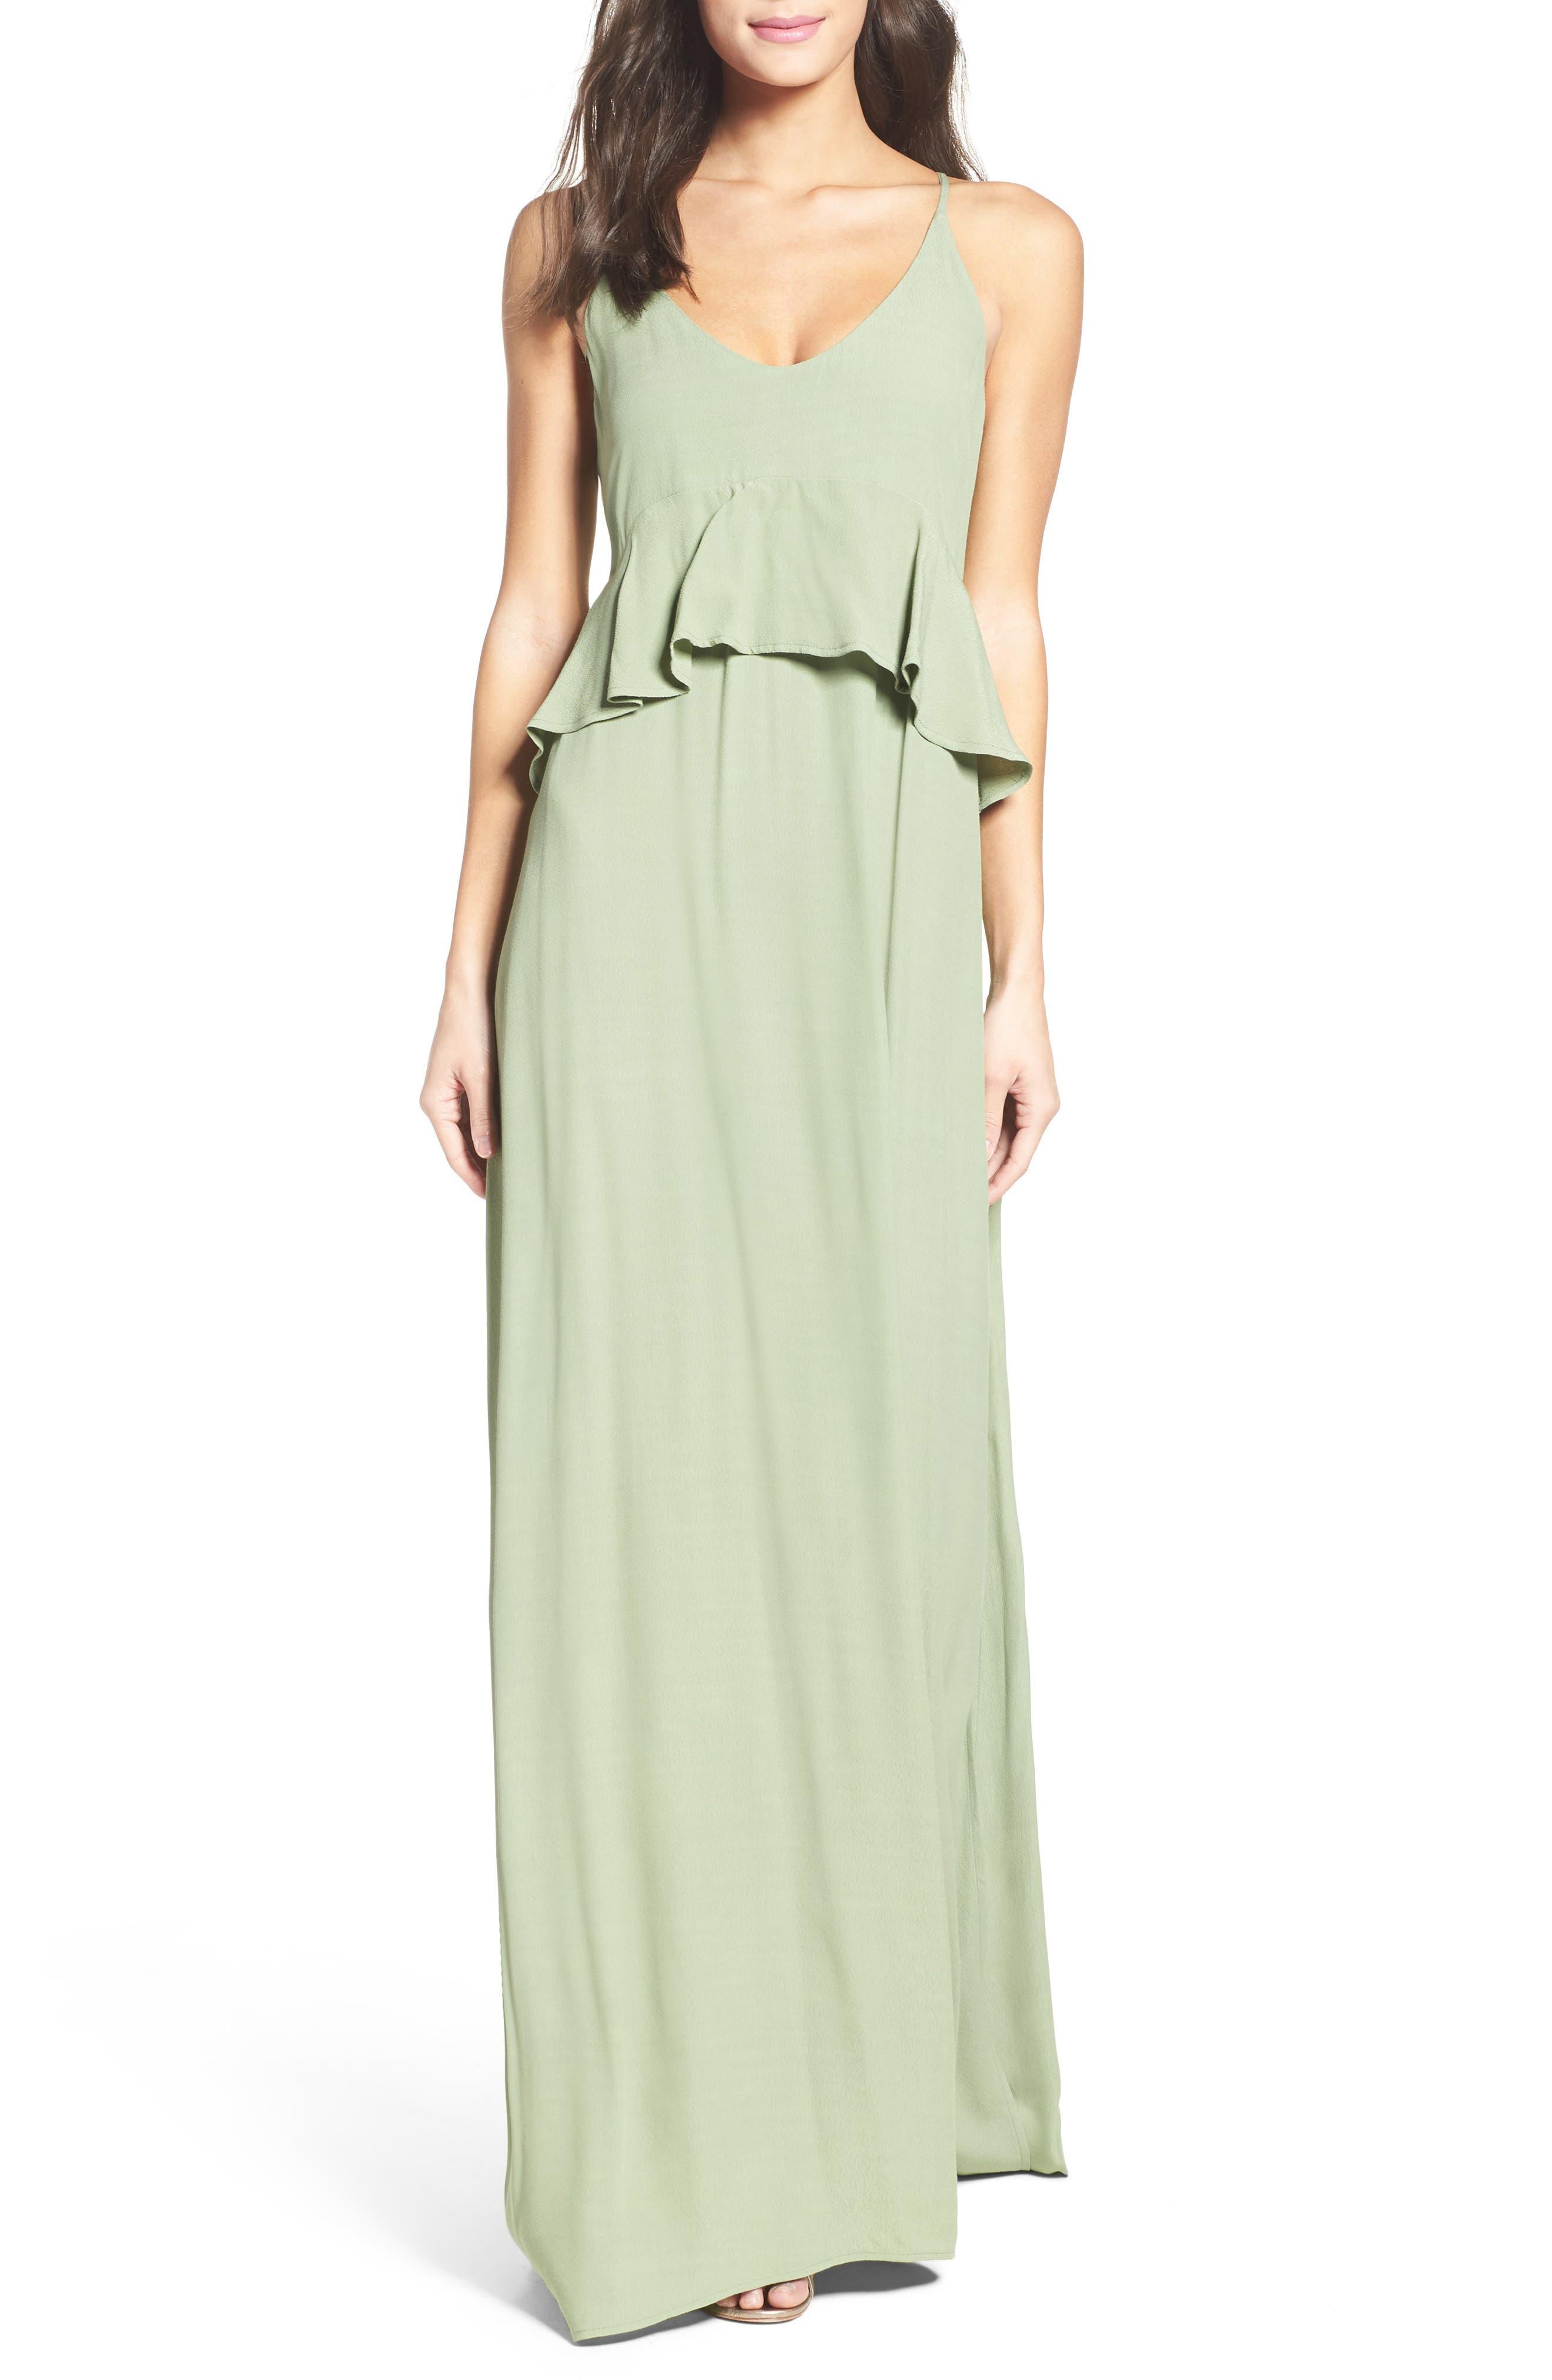 Roe + May Jolie Crepe Peplum Dress,                         Main,                         color, Sage